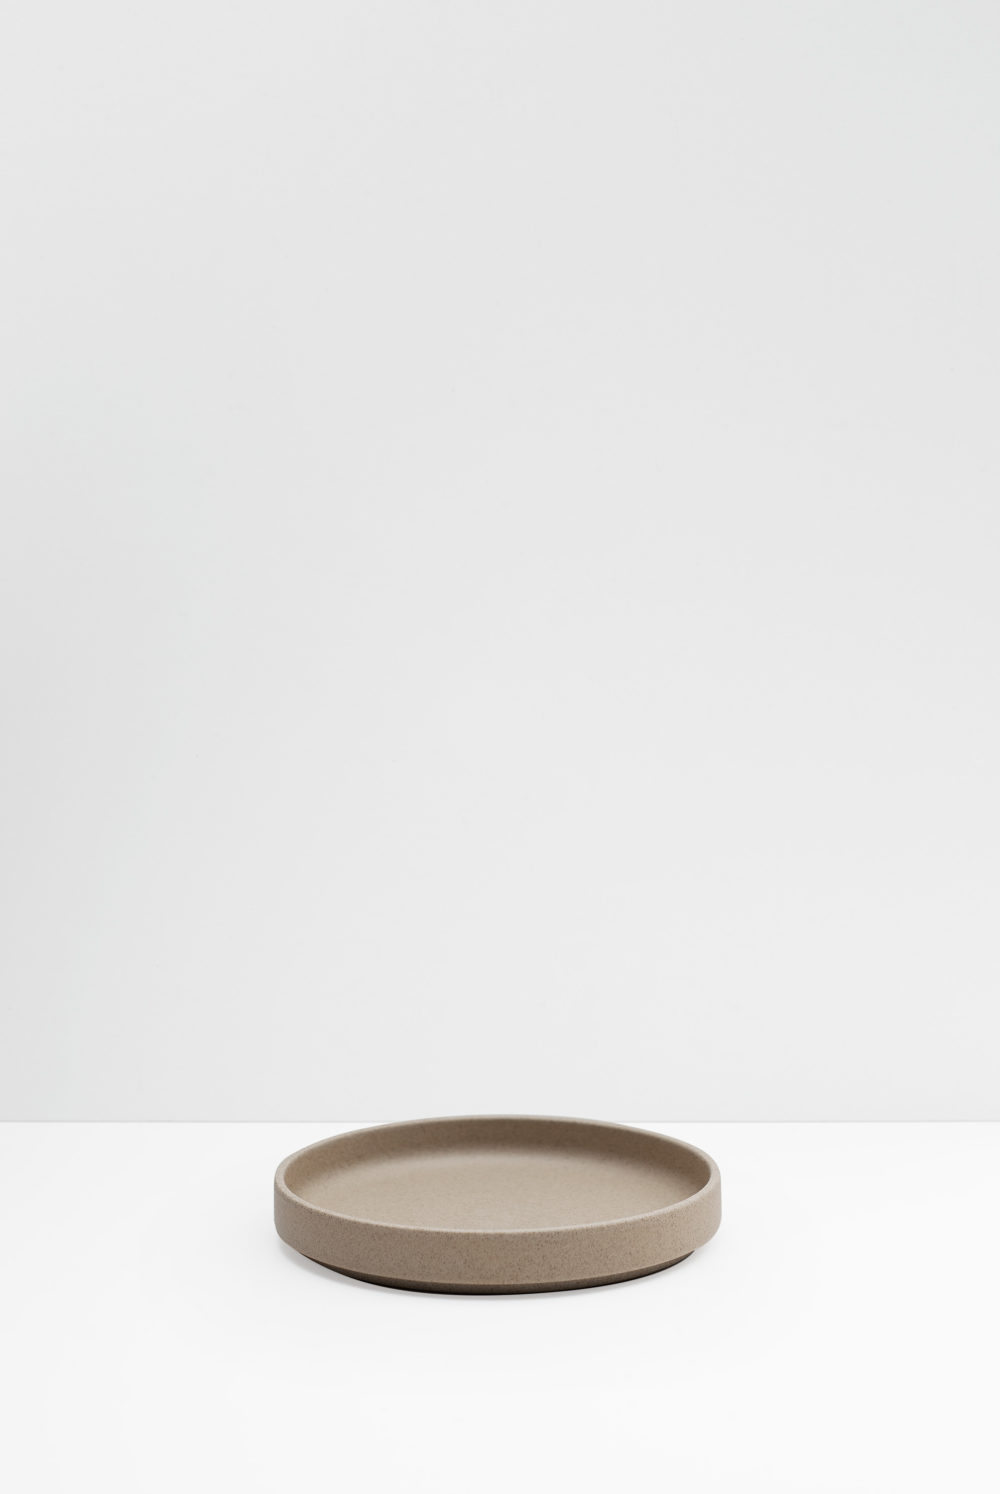 Hasami Porcelain side plate